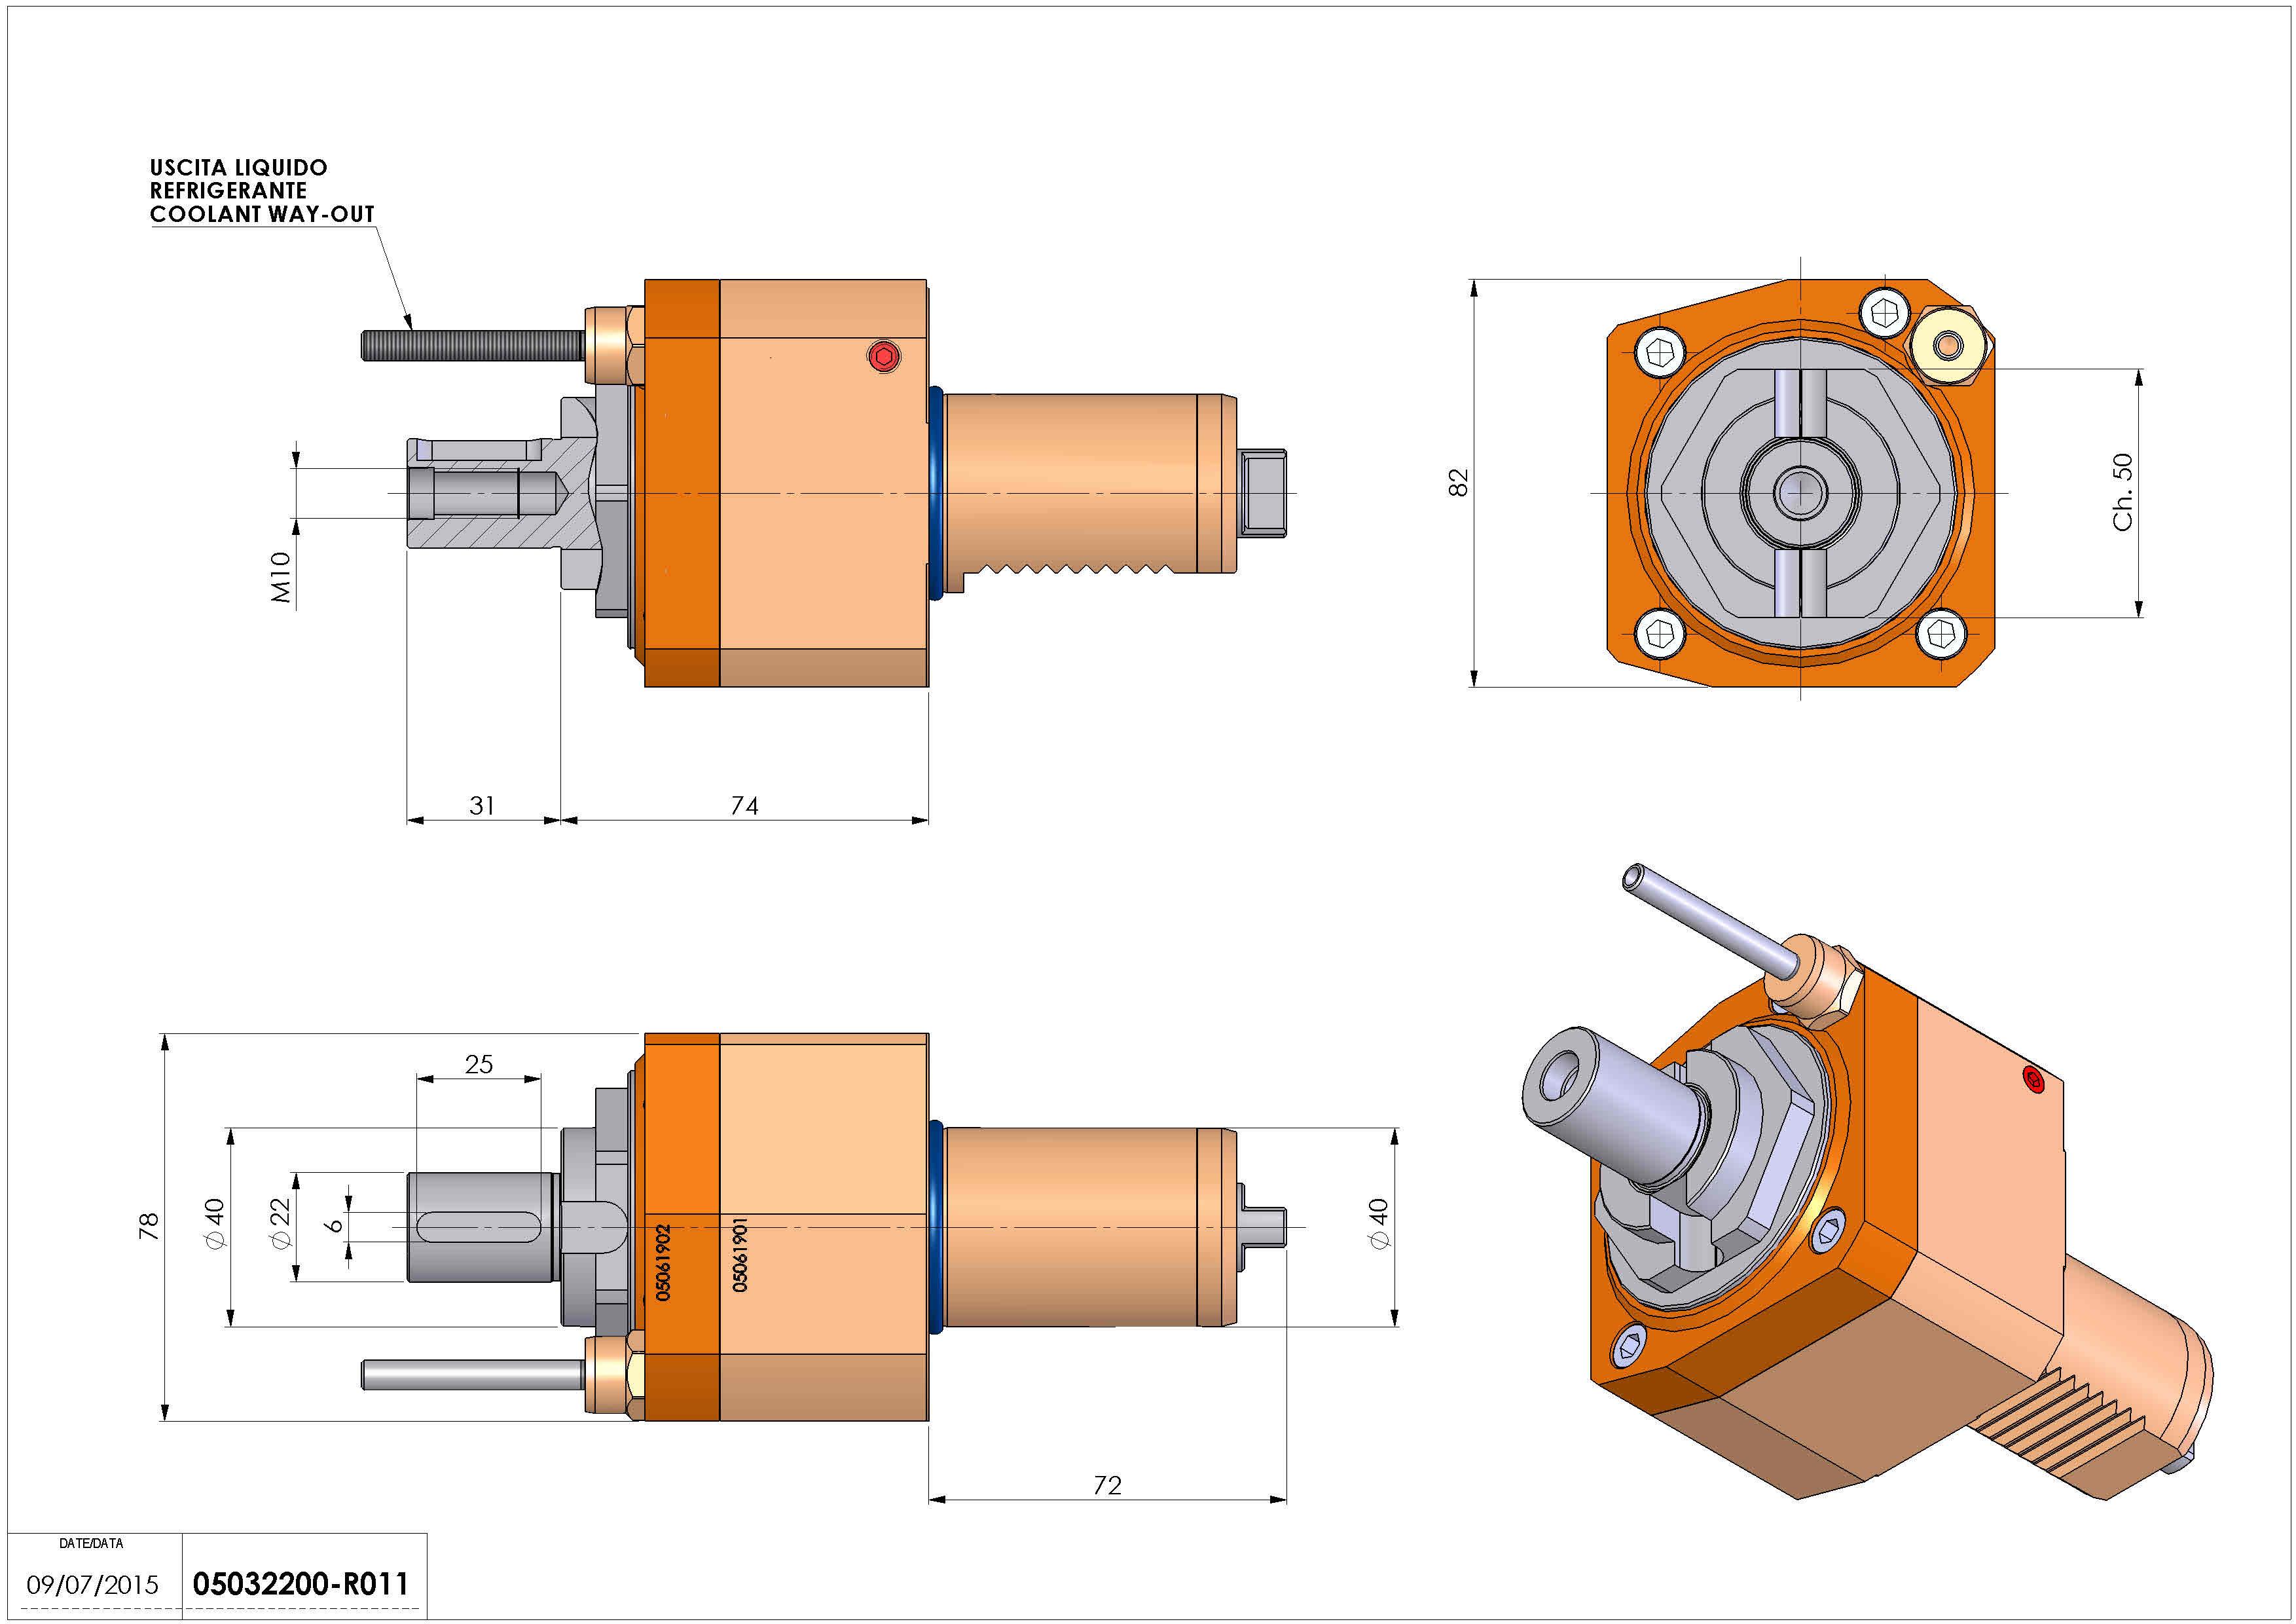 Technical image - LT-S VDI40 DIN138-22 H74 TW-TZ.